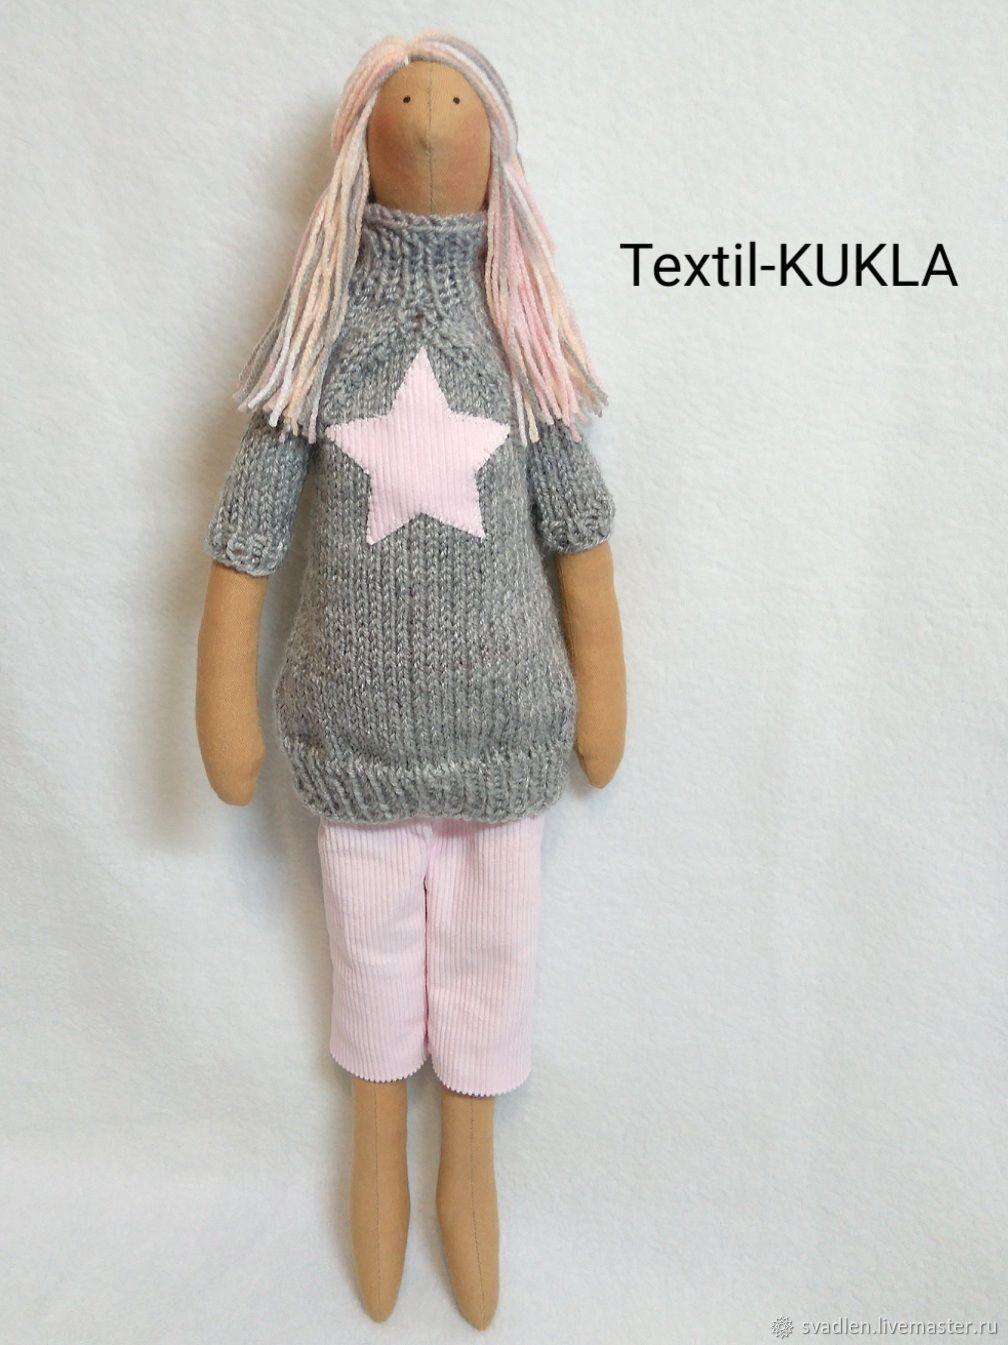 Stylish Tilda doll - pink hair)) - textile dolls, Tilda Dolls, Bryansk,  Фото №1